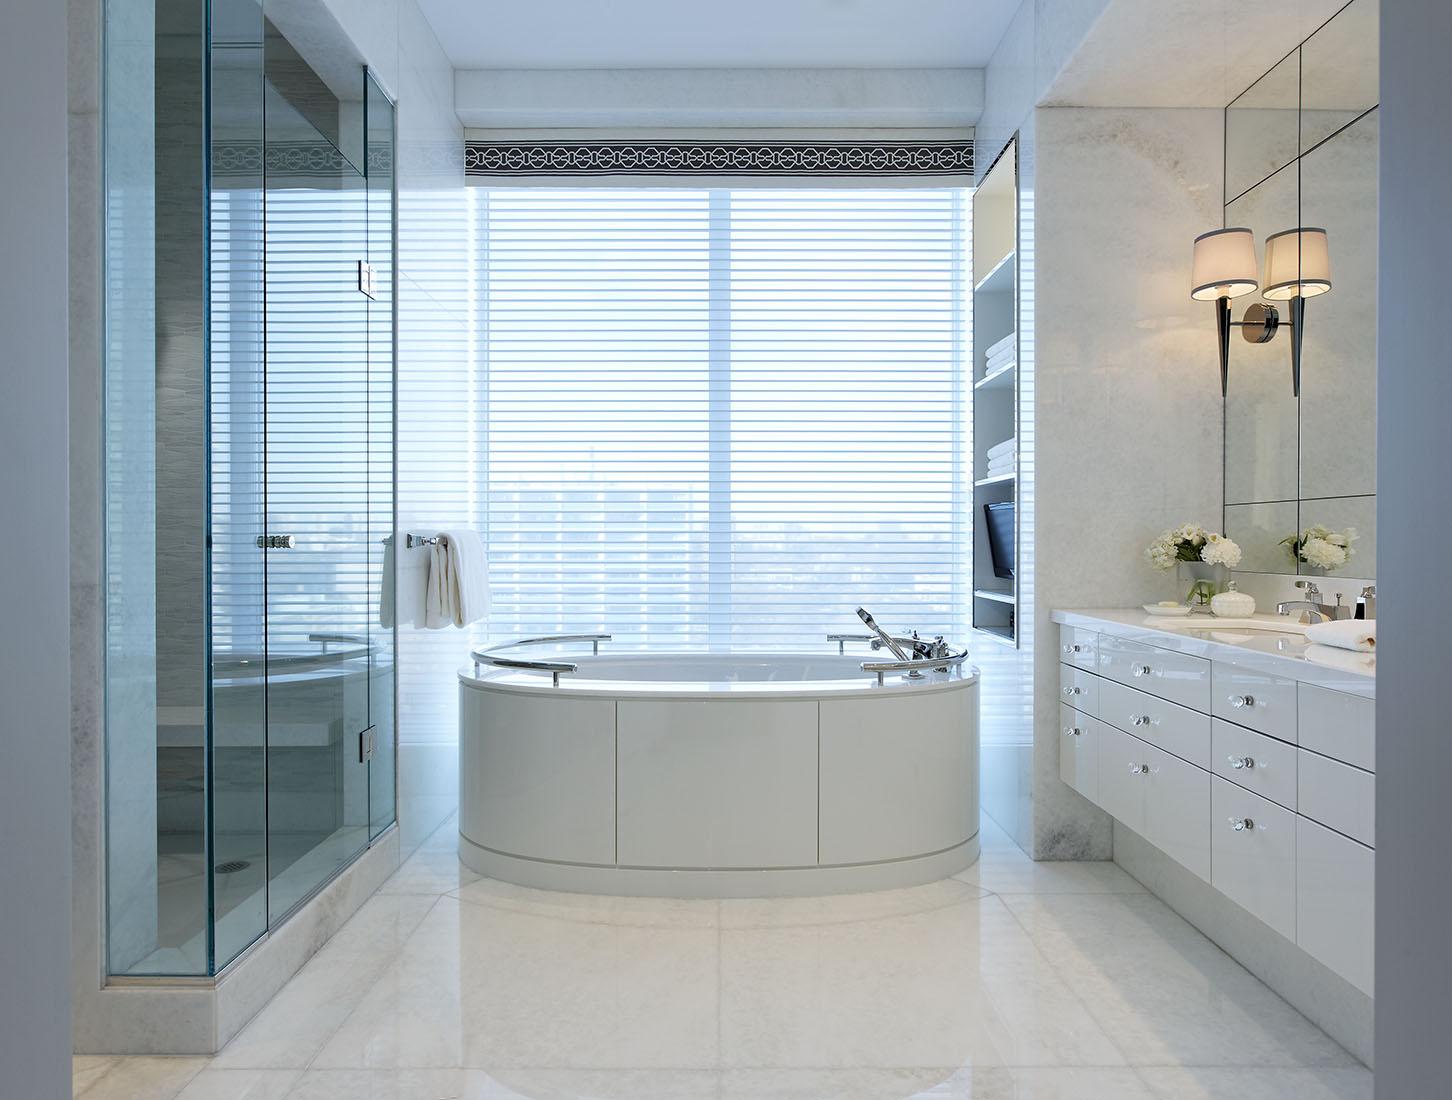 38_Bathroom.jpg